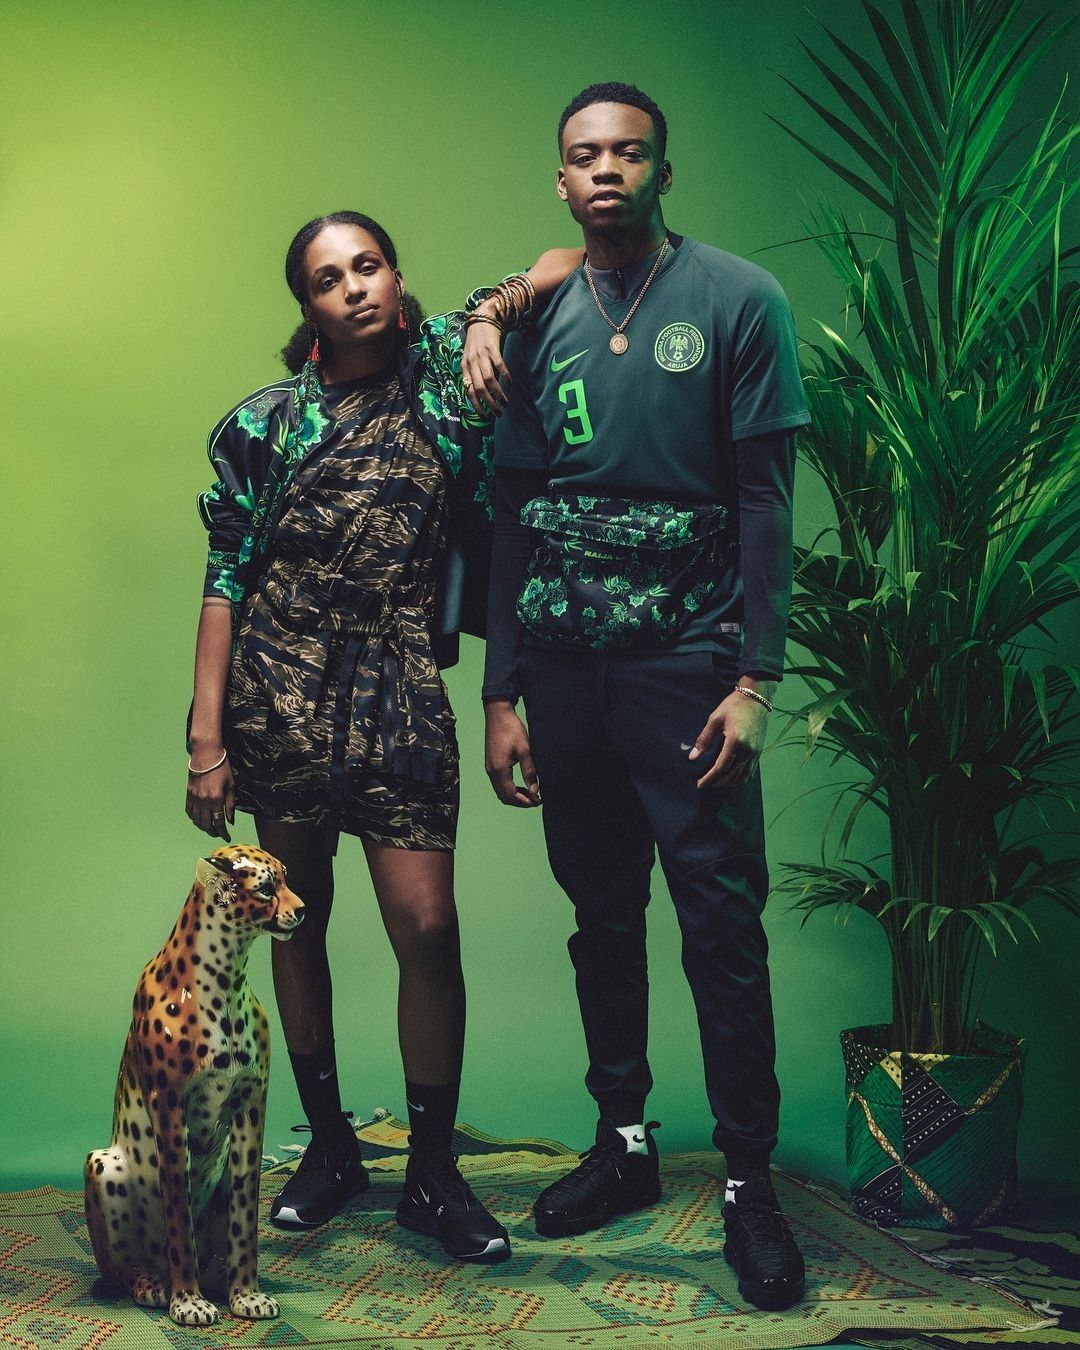 The Nigeria National Team Collection Nike Nikefootball Naija Football Nikesoccer Supereagles Worldcup Russ Football Fashion Sports Stars Nike Football